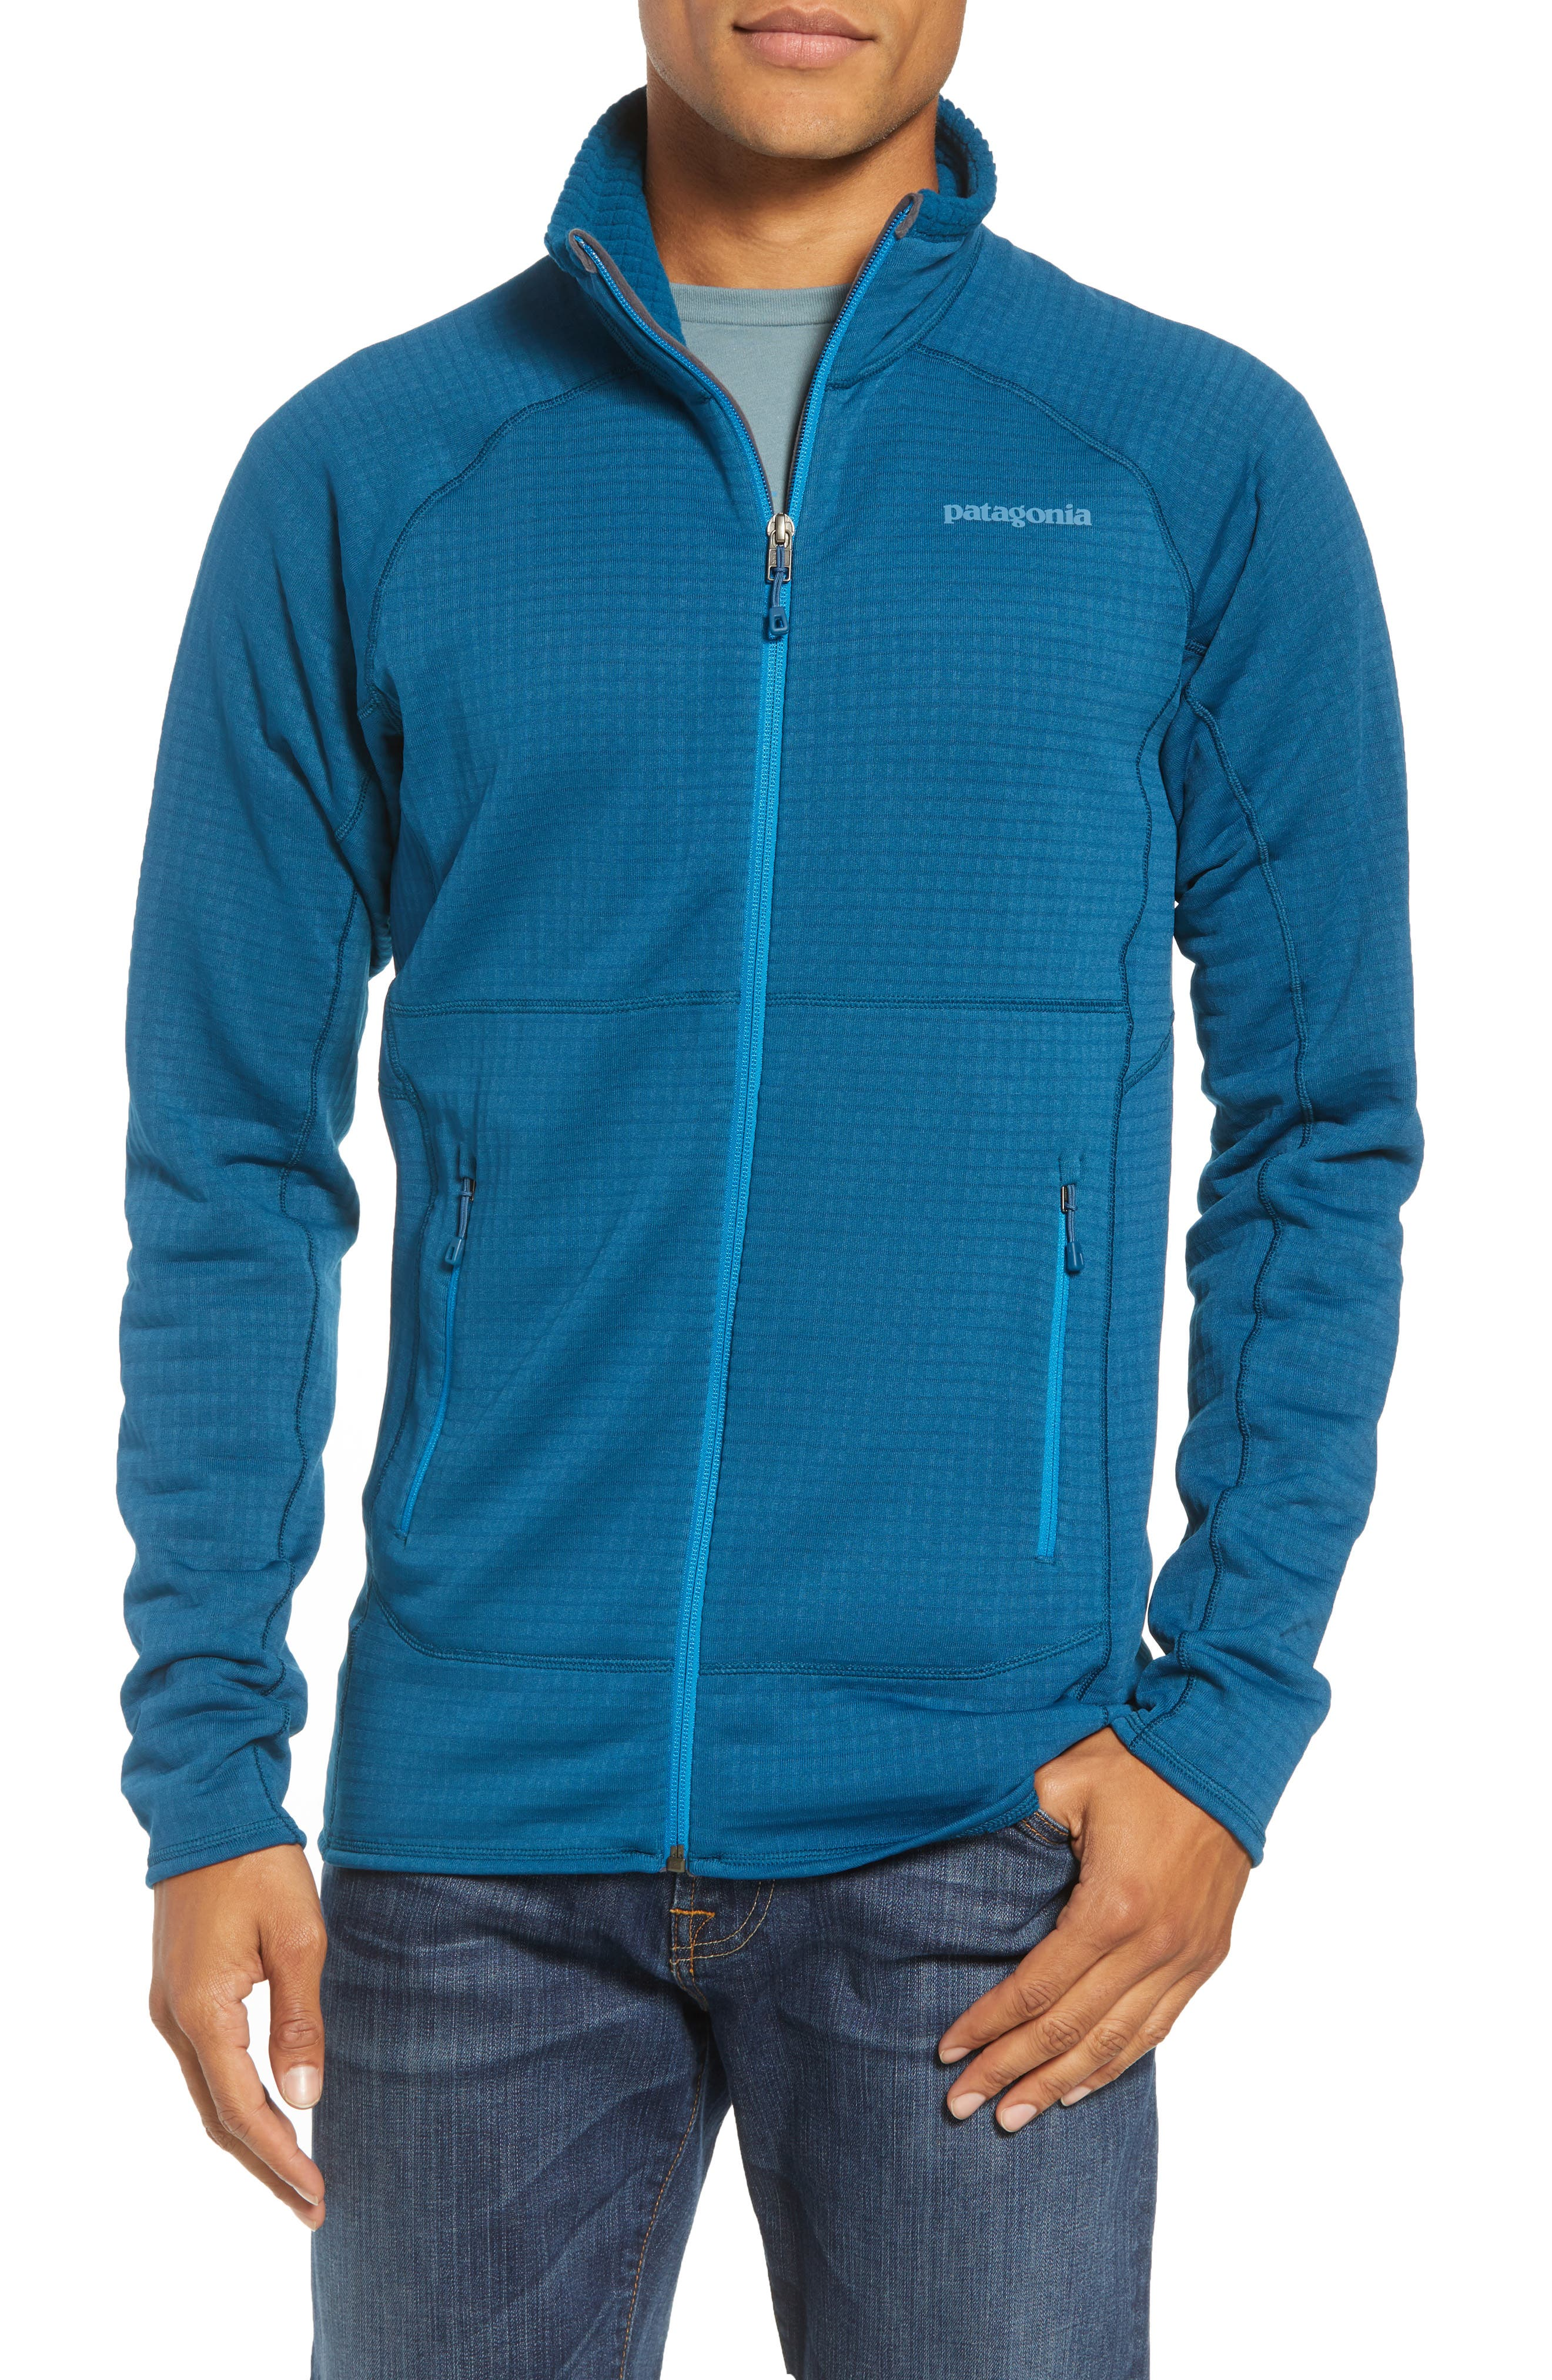 Patagonia R1 Full Zip Jacket, Blue